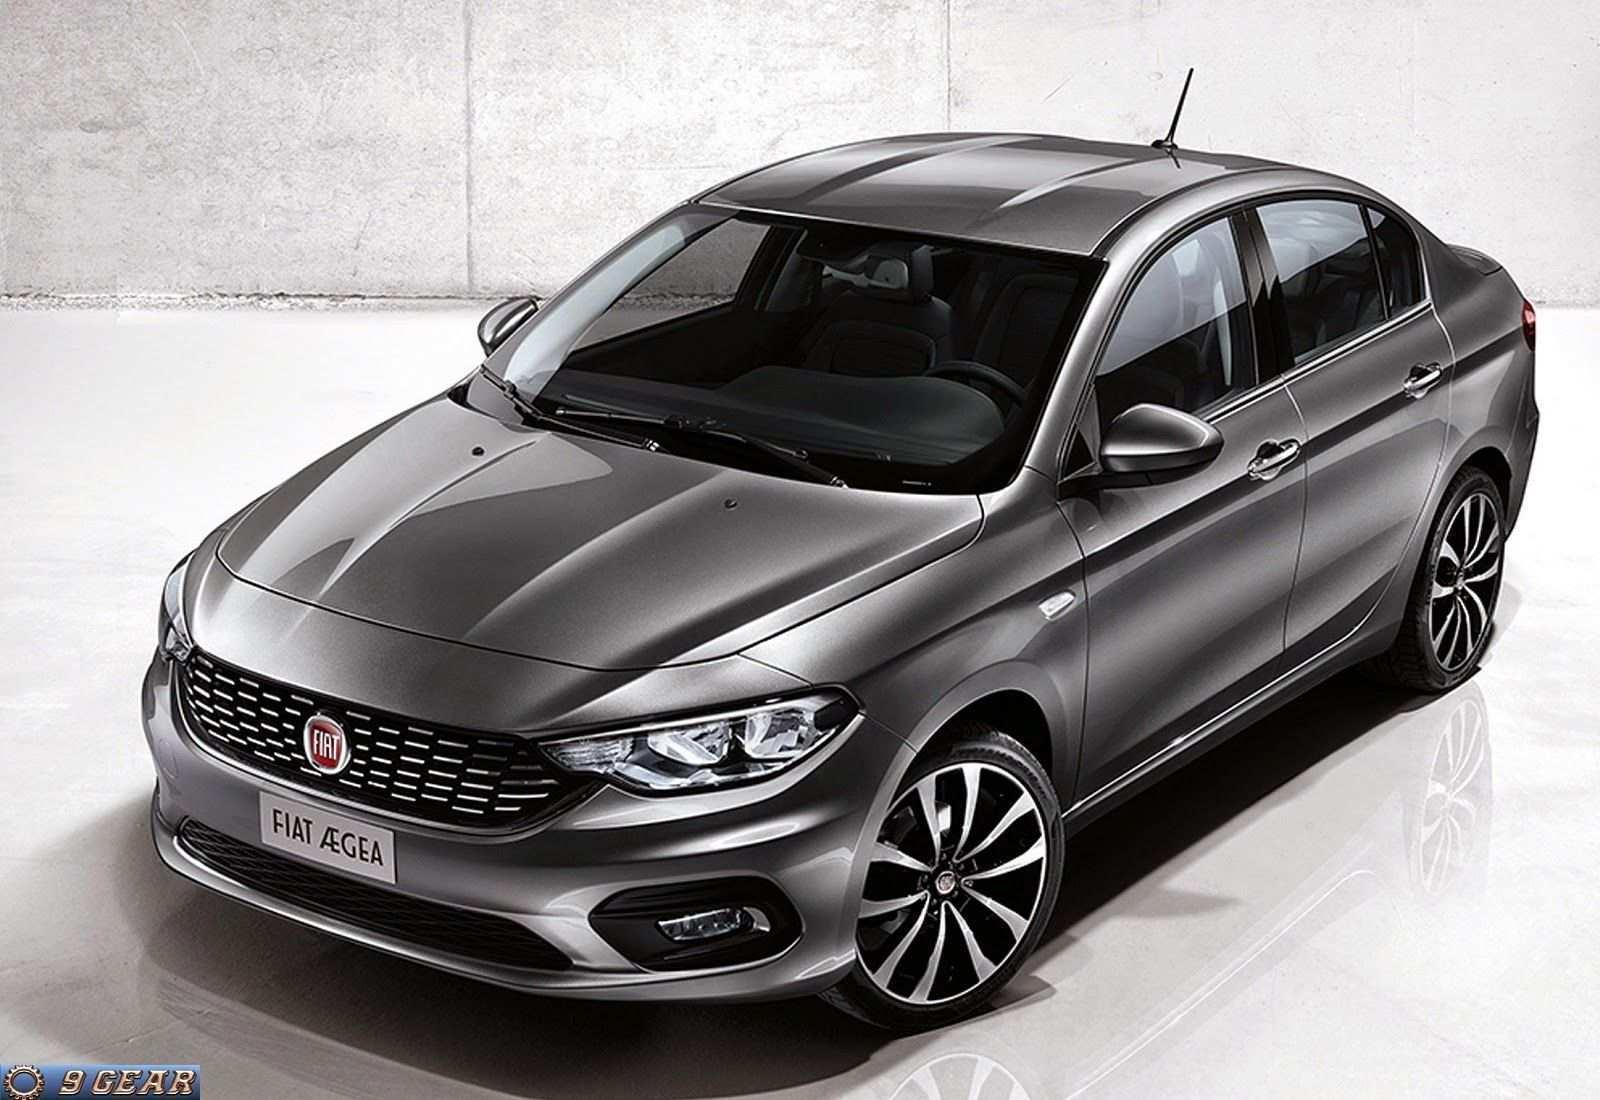 62 Gallery of 2020 Fiat Aegea Release Date with 2020 Fiat Aegea